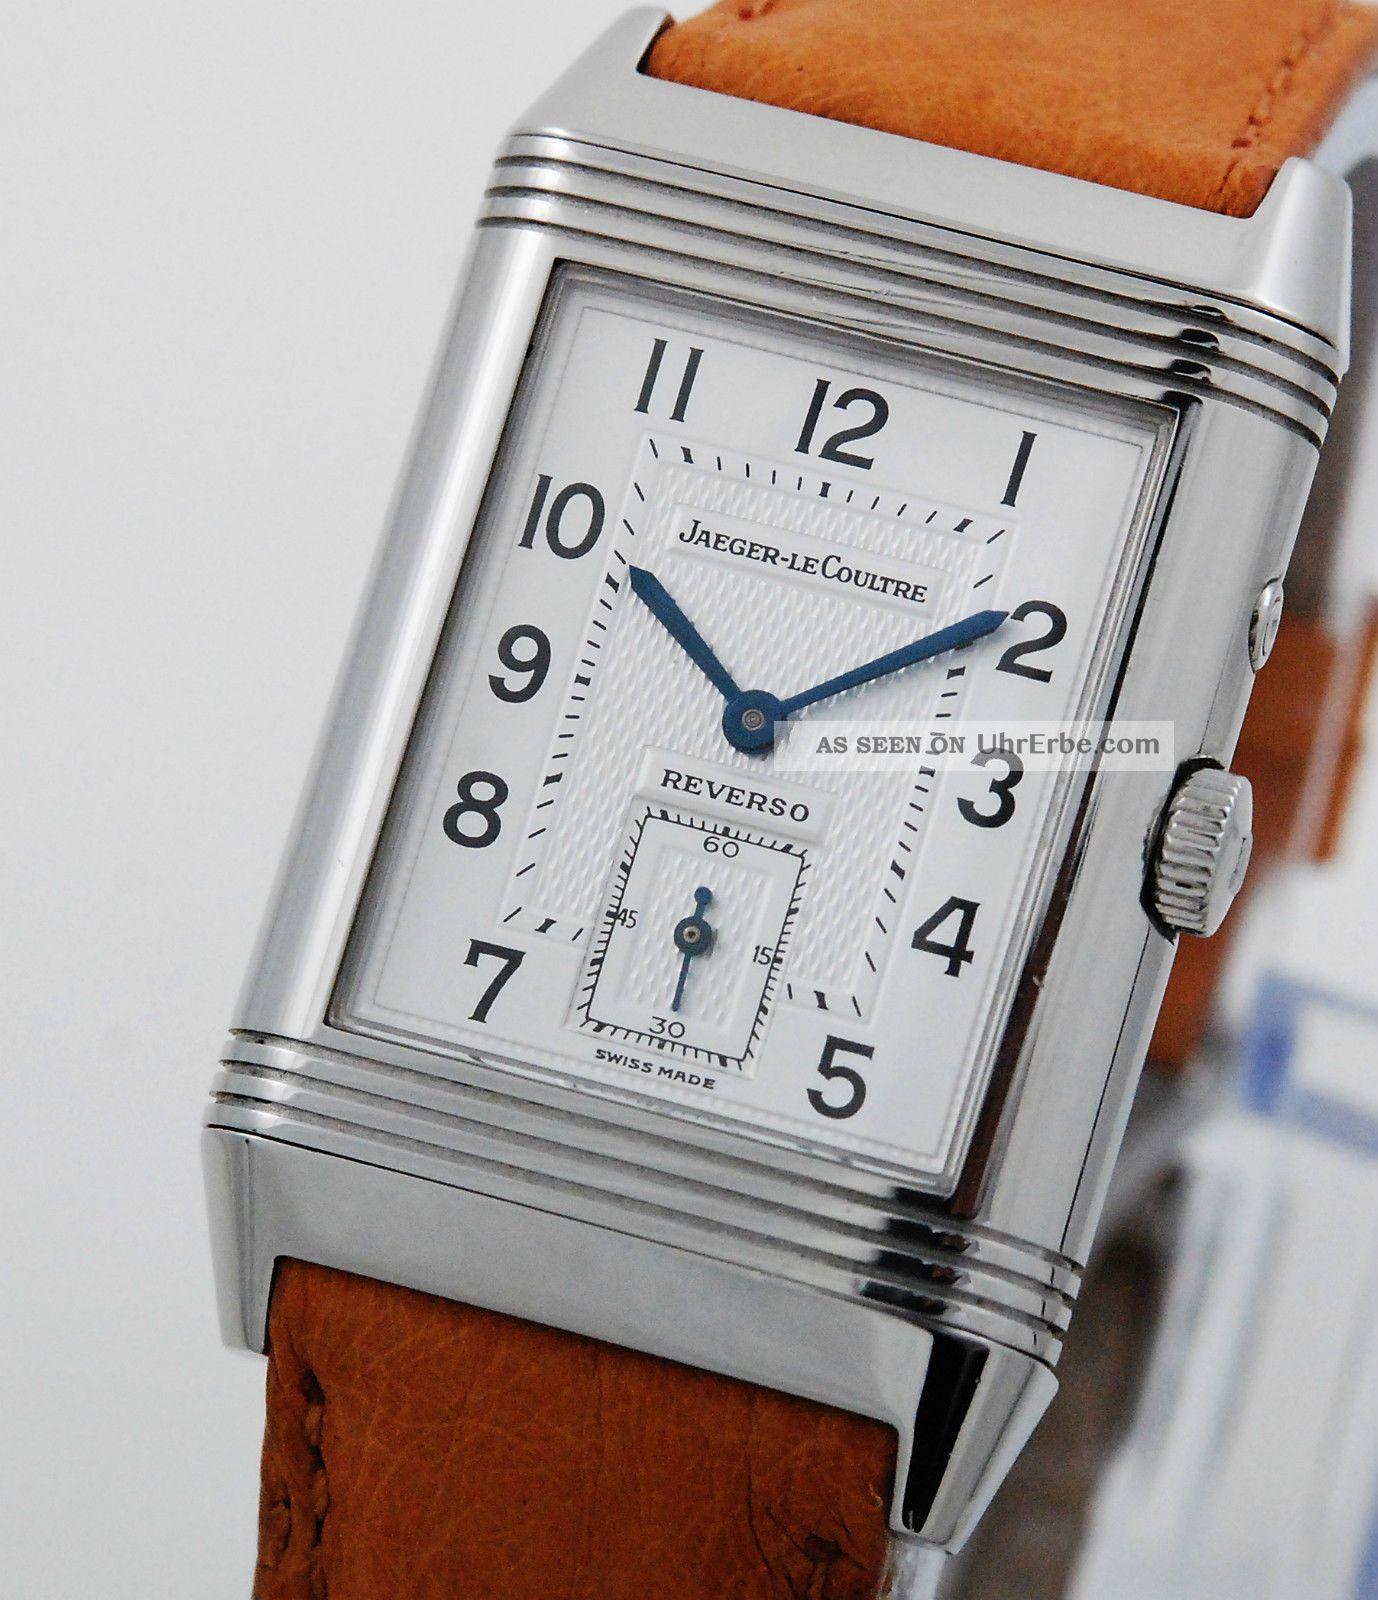 Jaeger Lecoultre Reverso Douface Night & Day 270.  8.  54 Armbanduhren Bild